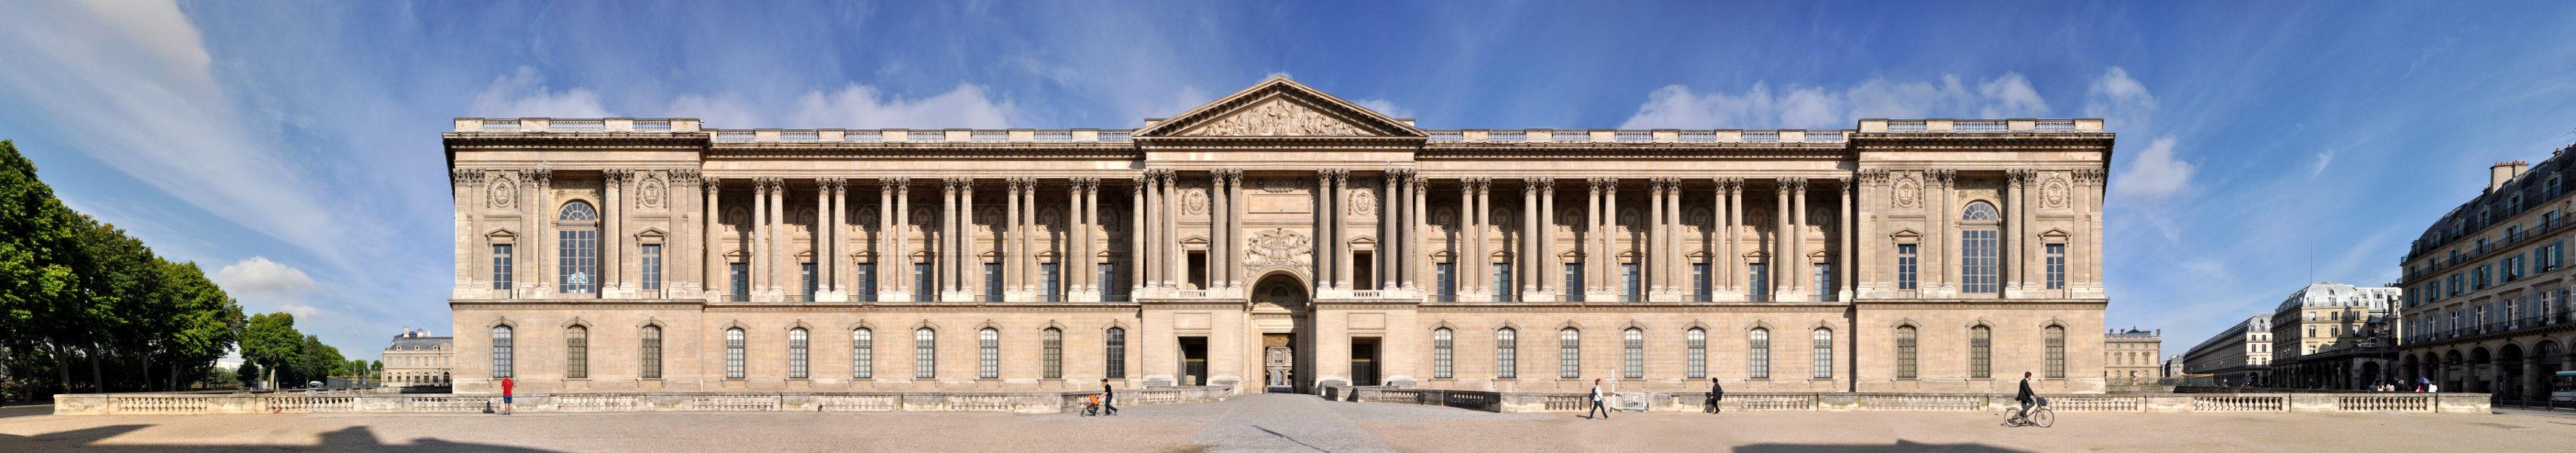 Louvre | Colonnade de Perrault